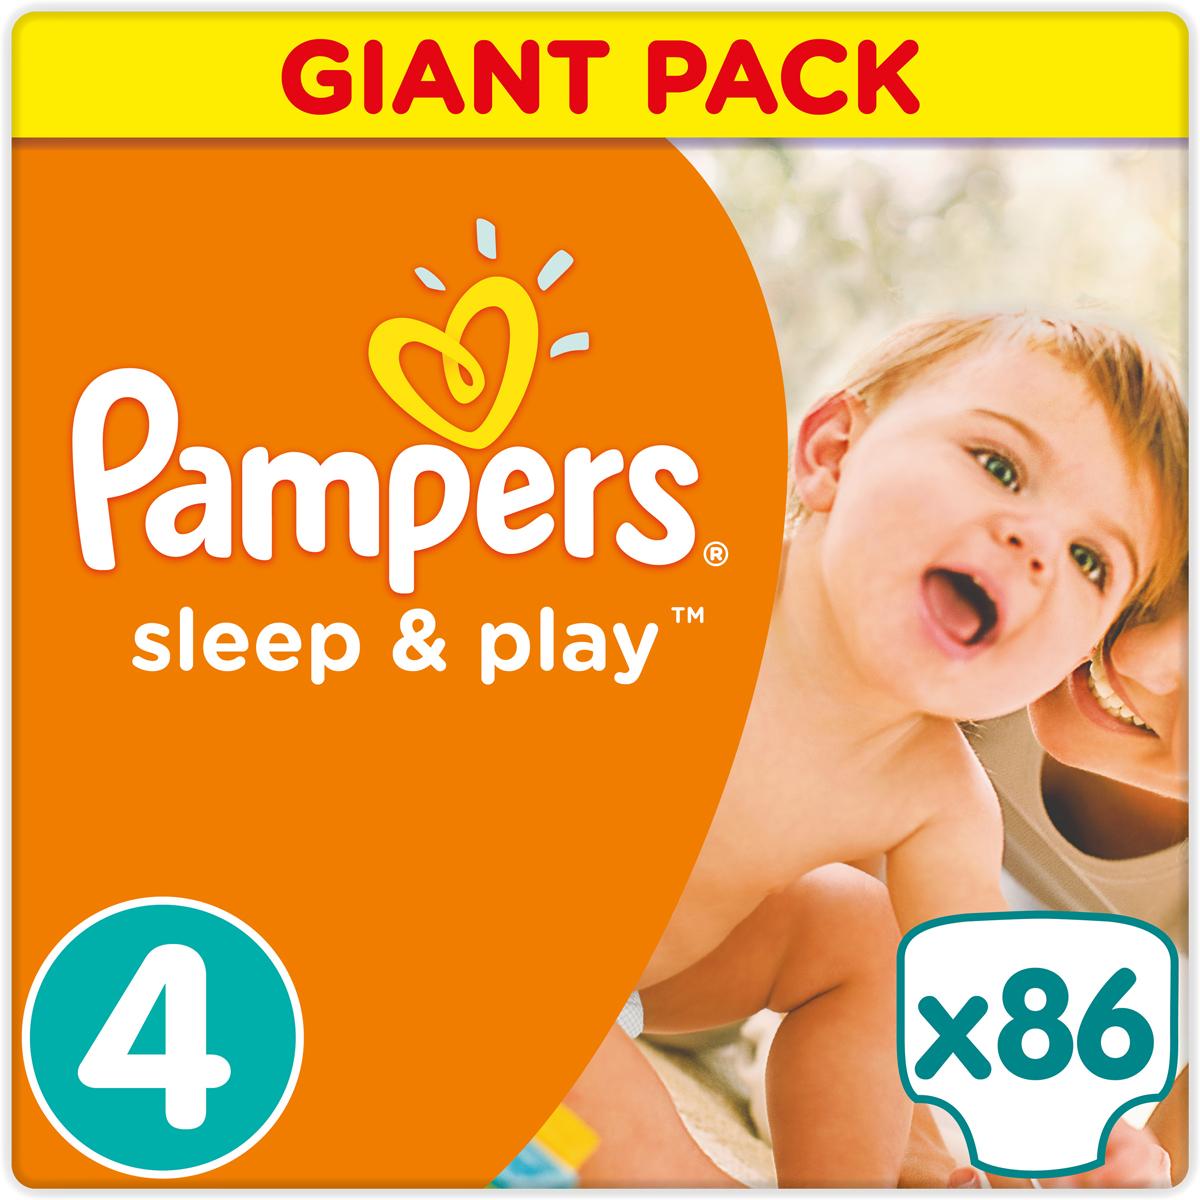 Pampers Подгузники Sleep & Play 8-14 кг (размер 4) 86 шт pampers pampers sleep